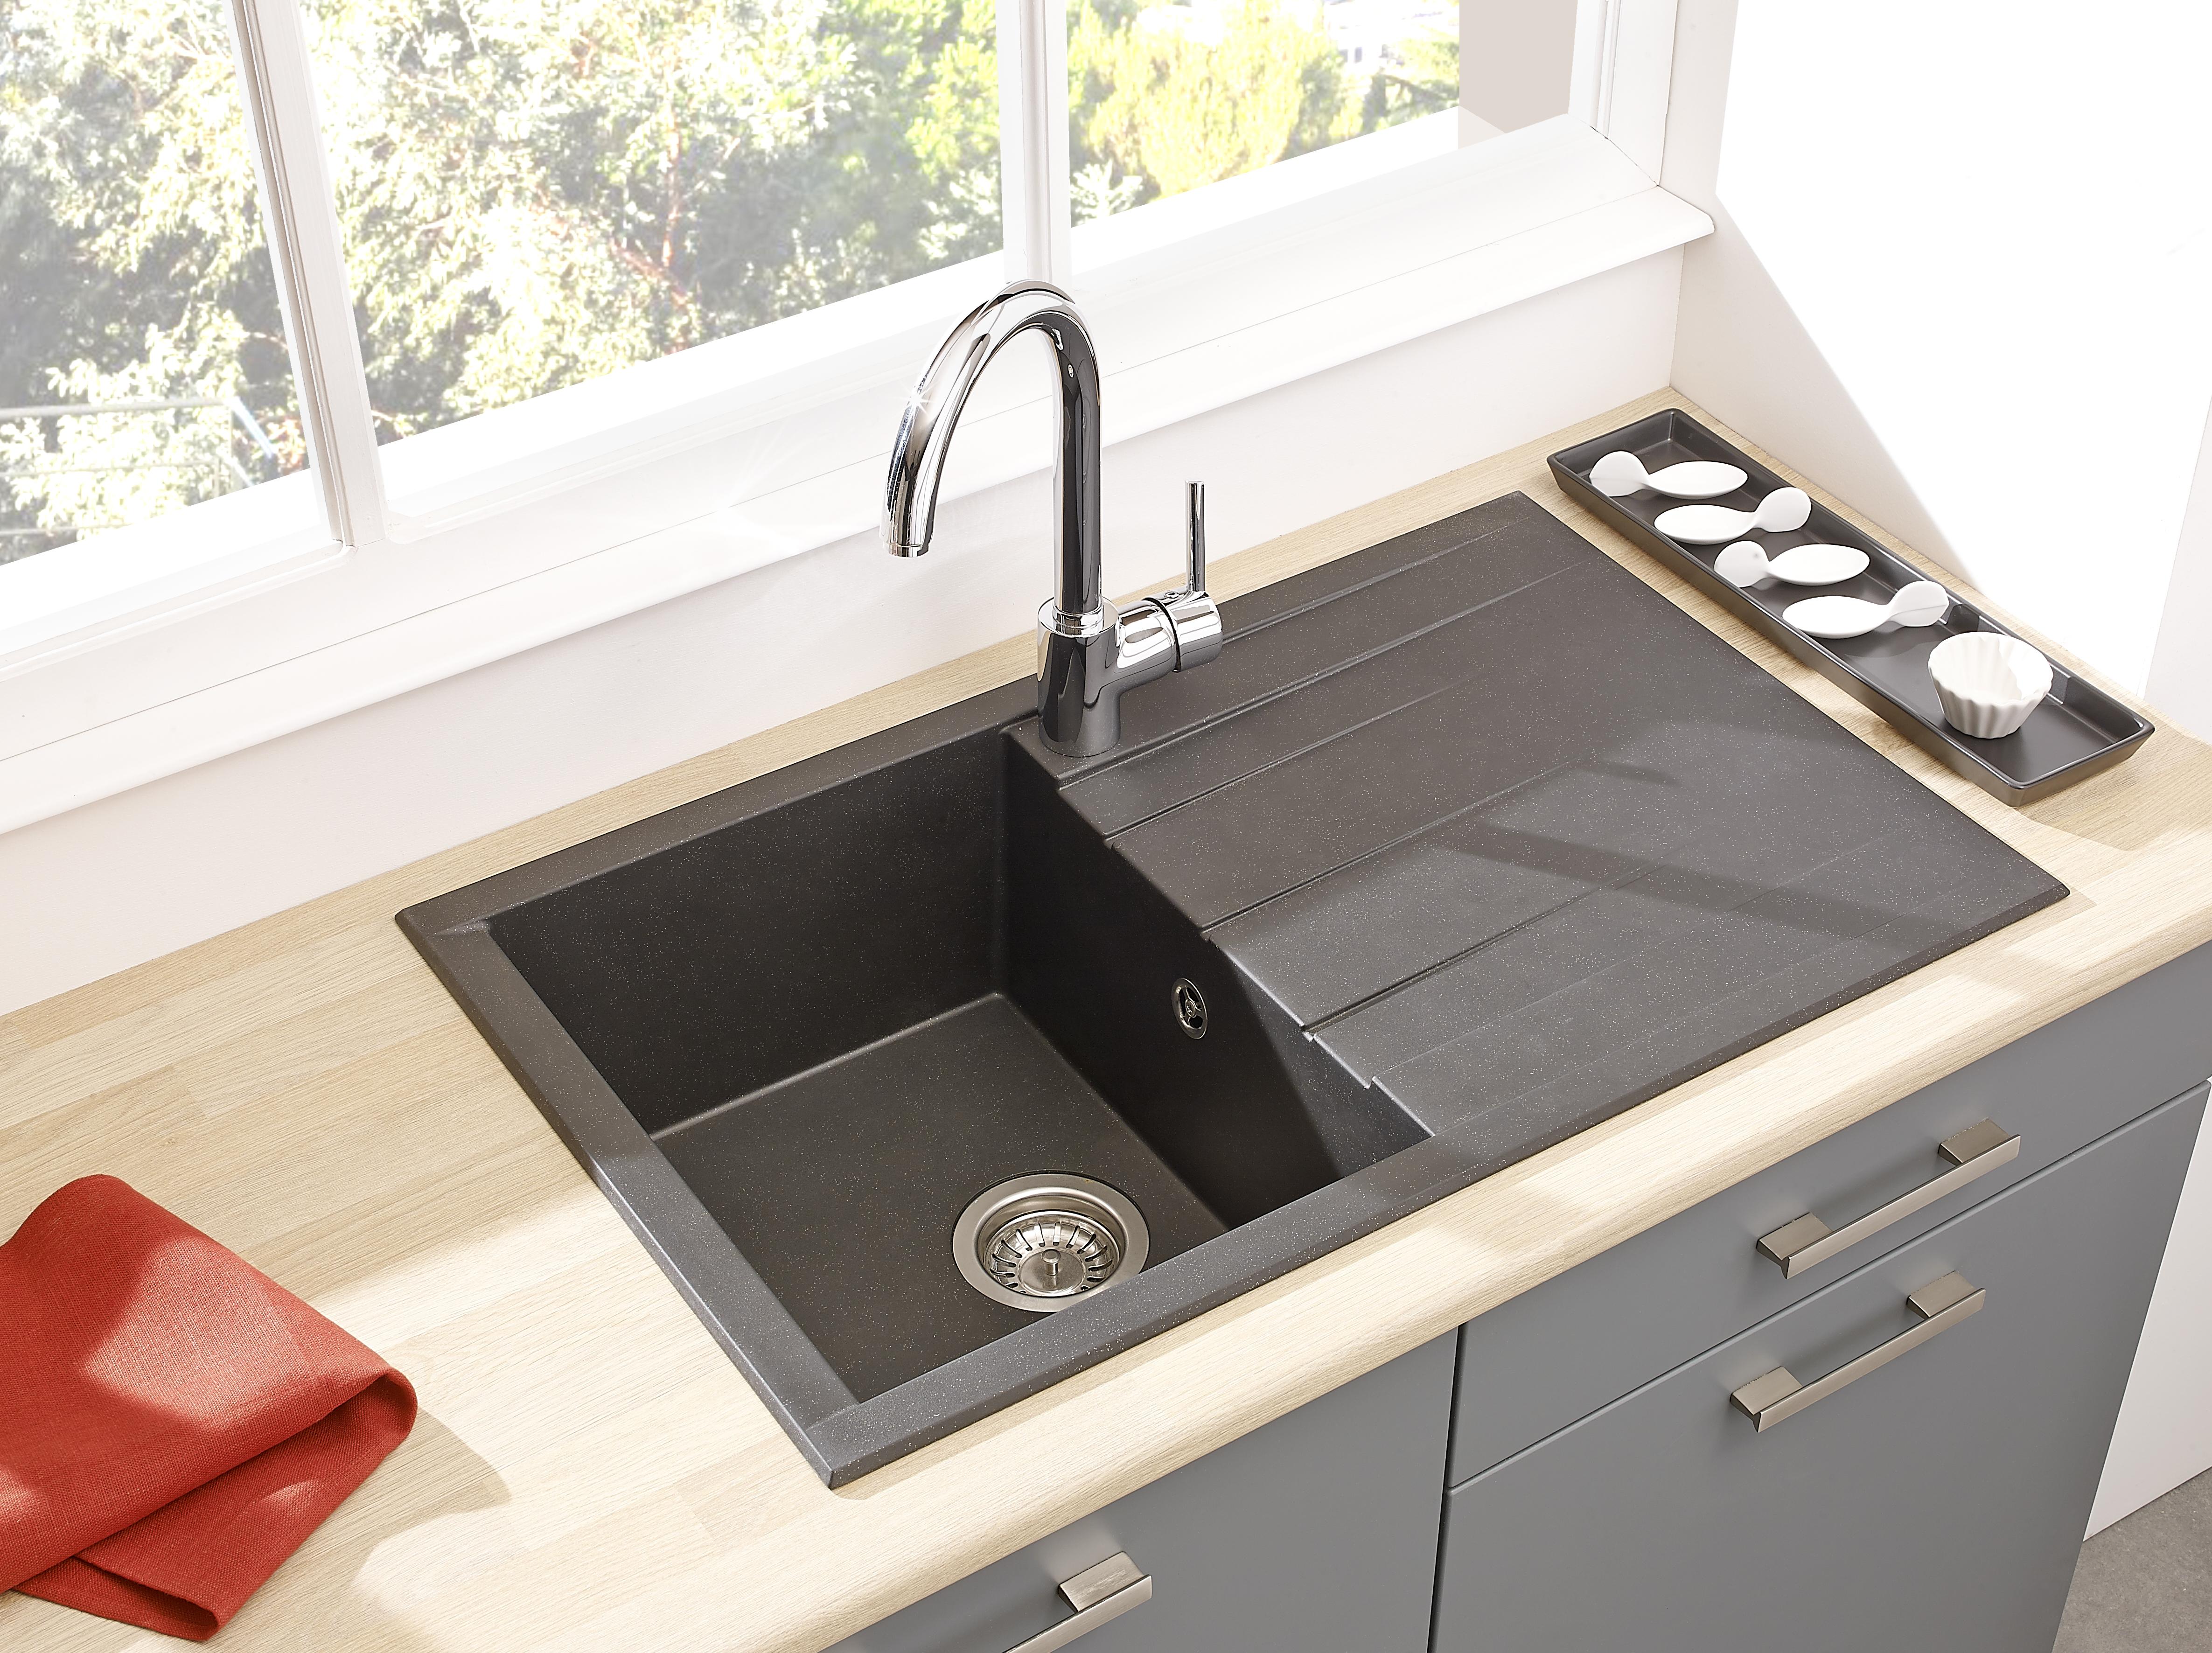 Spüle Küchenspüle Einbauspüle Granitspüle Mineralite 80 x 50 schwarz respekta